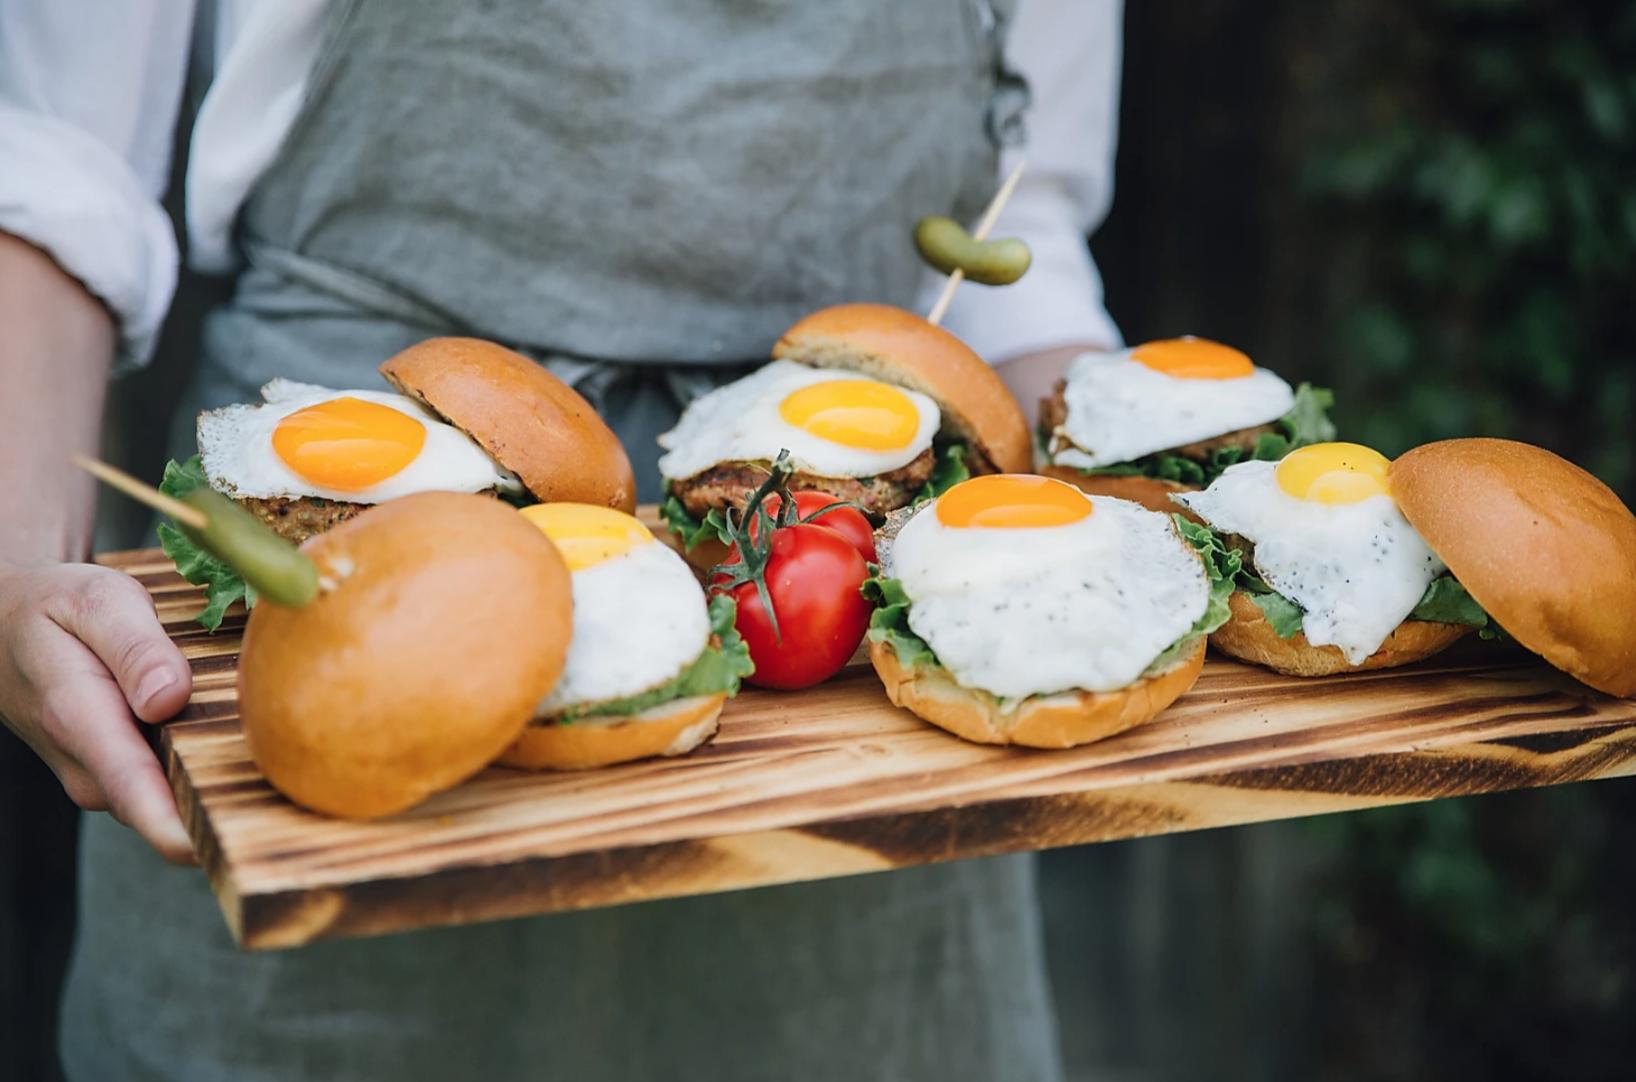 Egg burgers